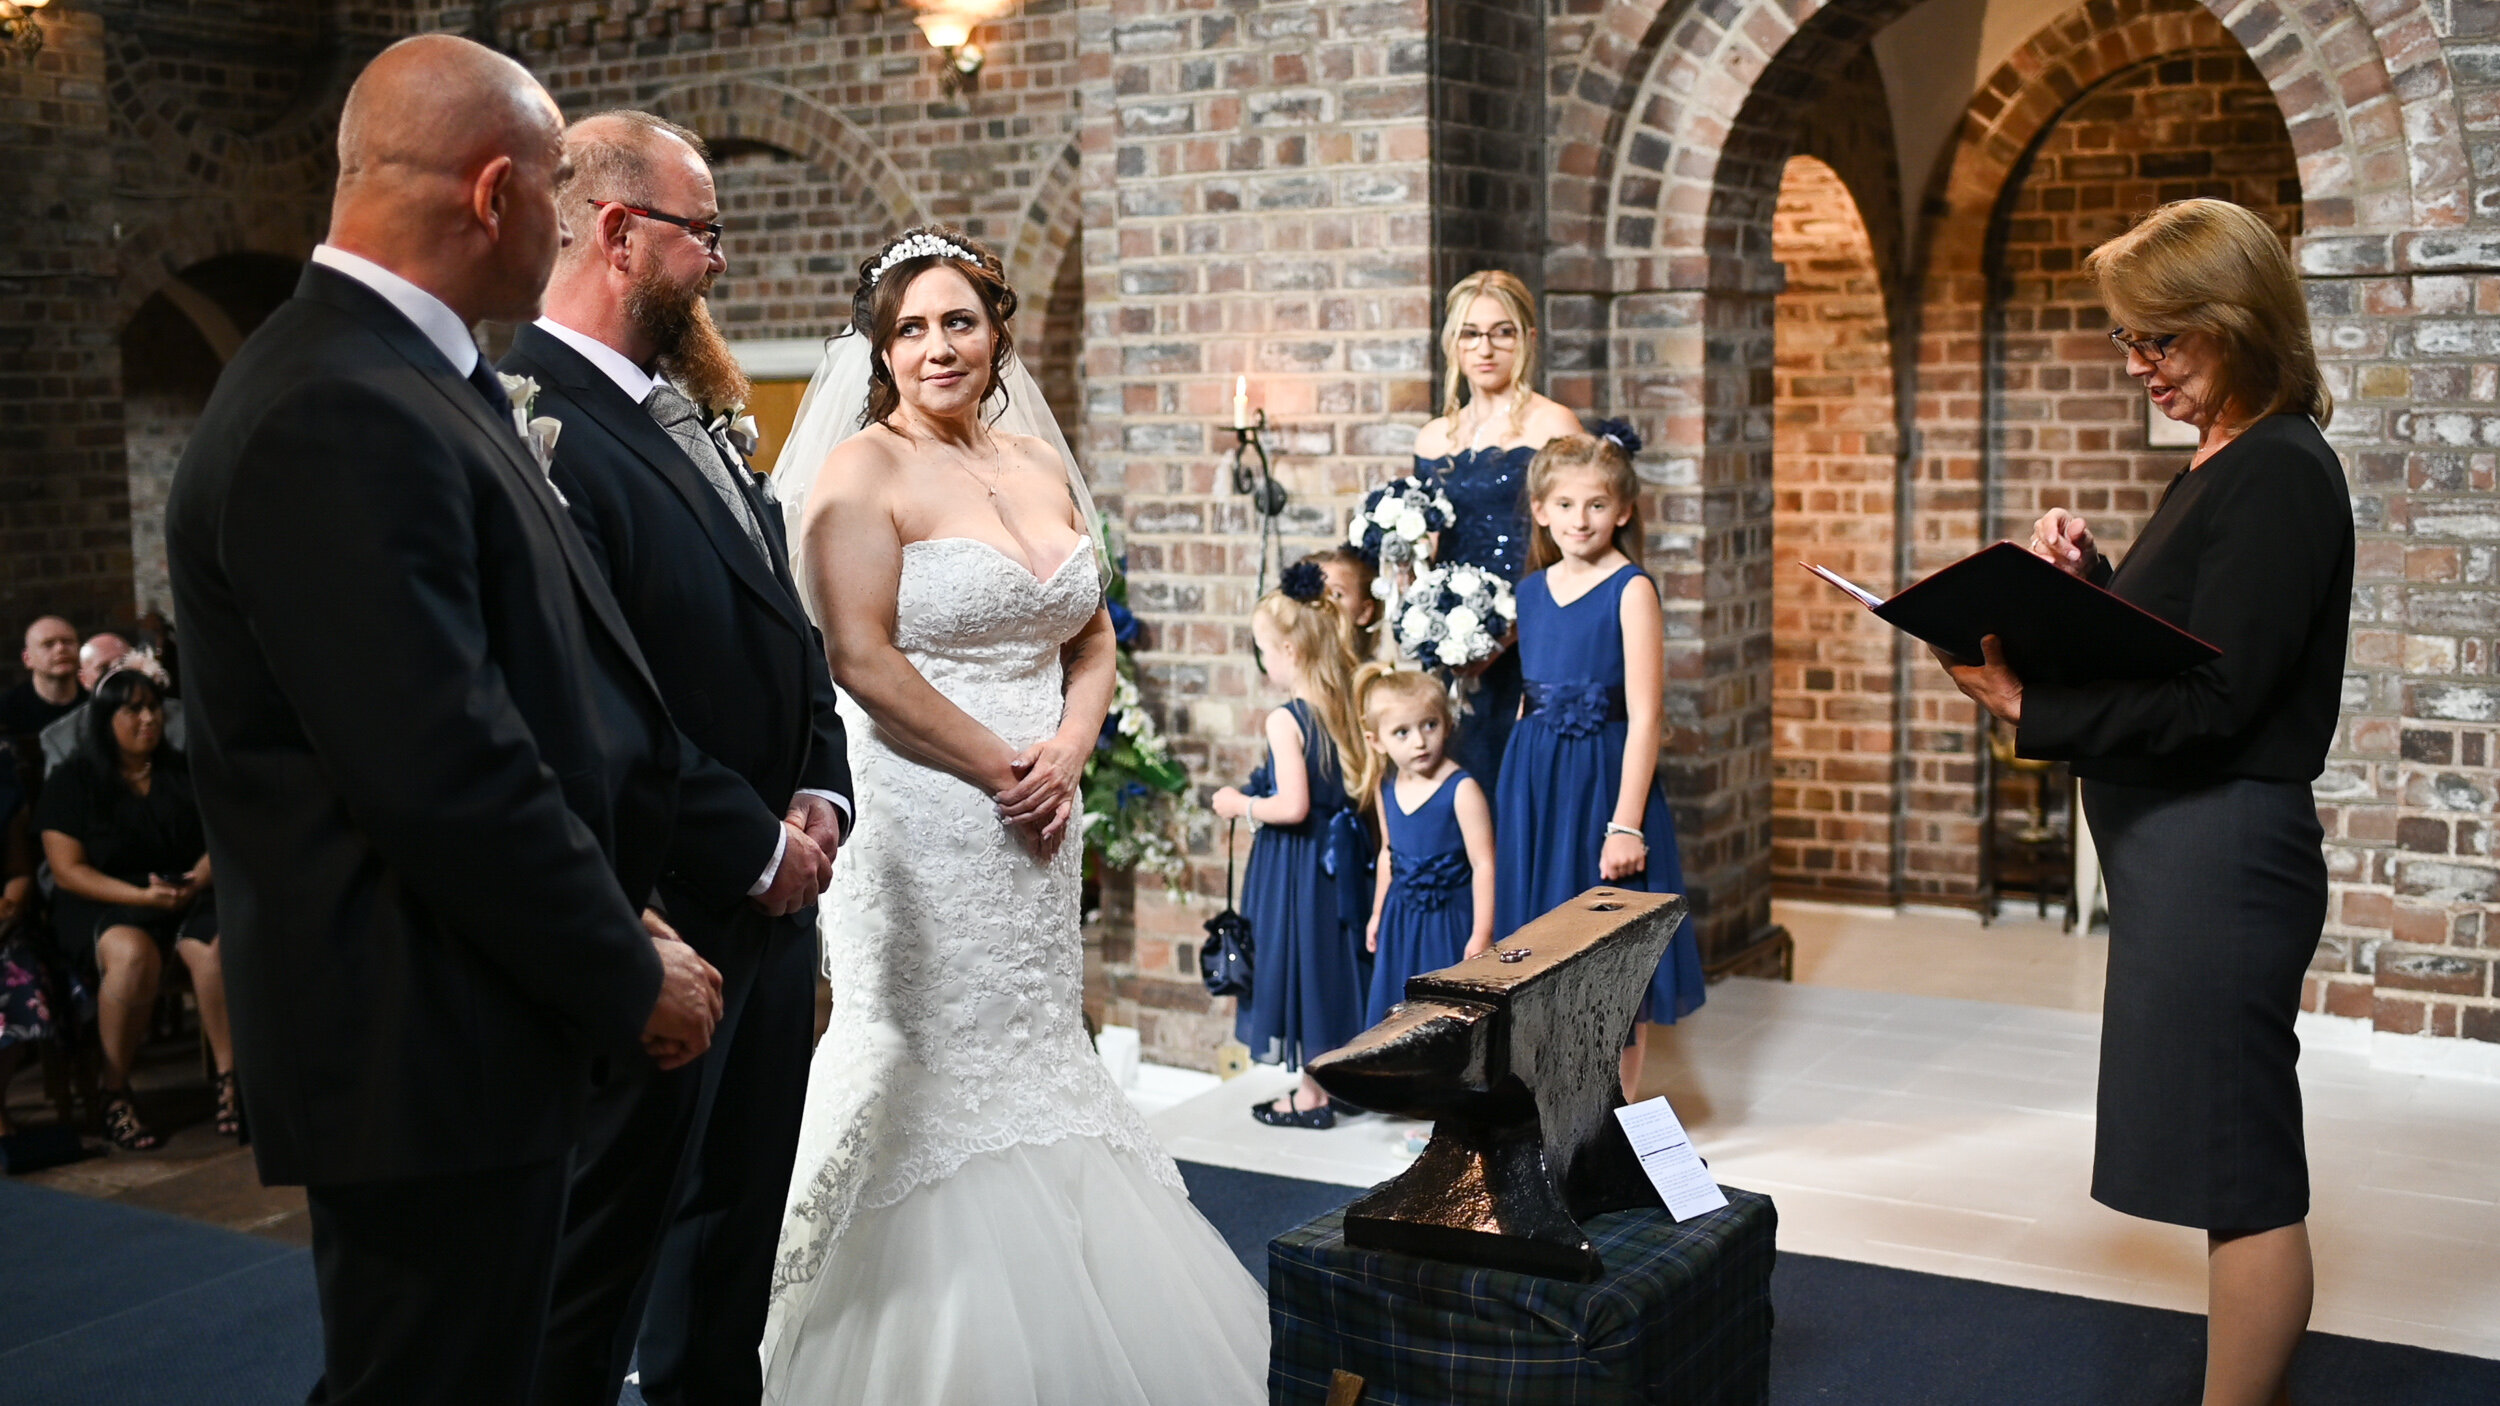 Heaton_wedding_photos_Gretna-12.jpg